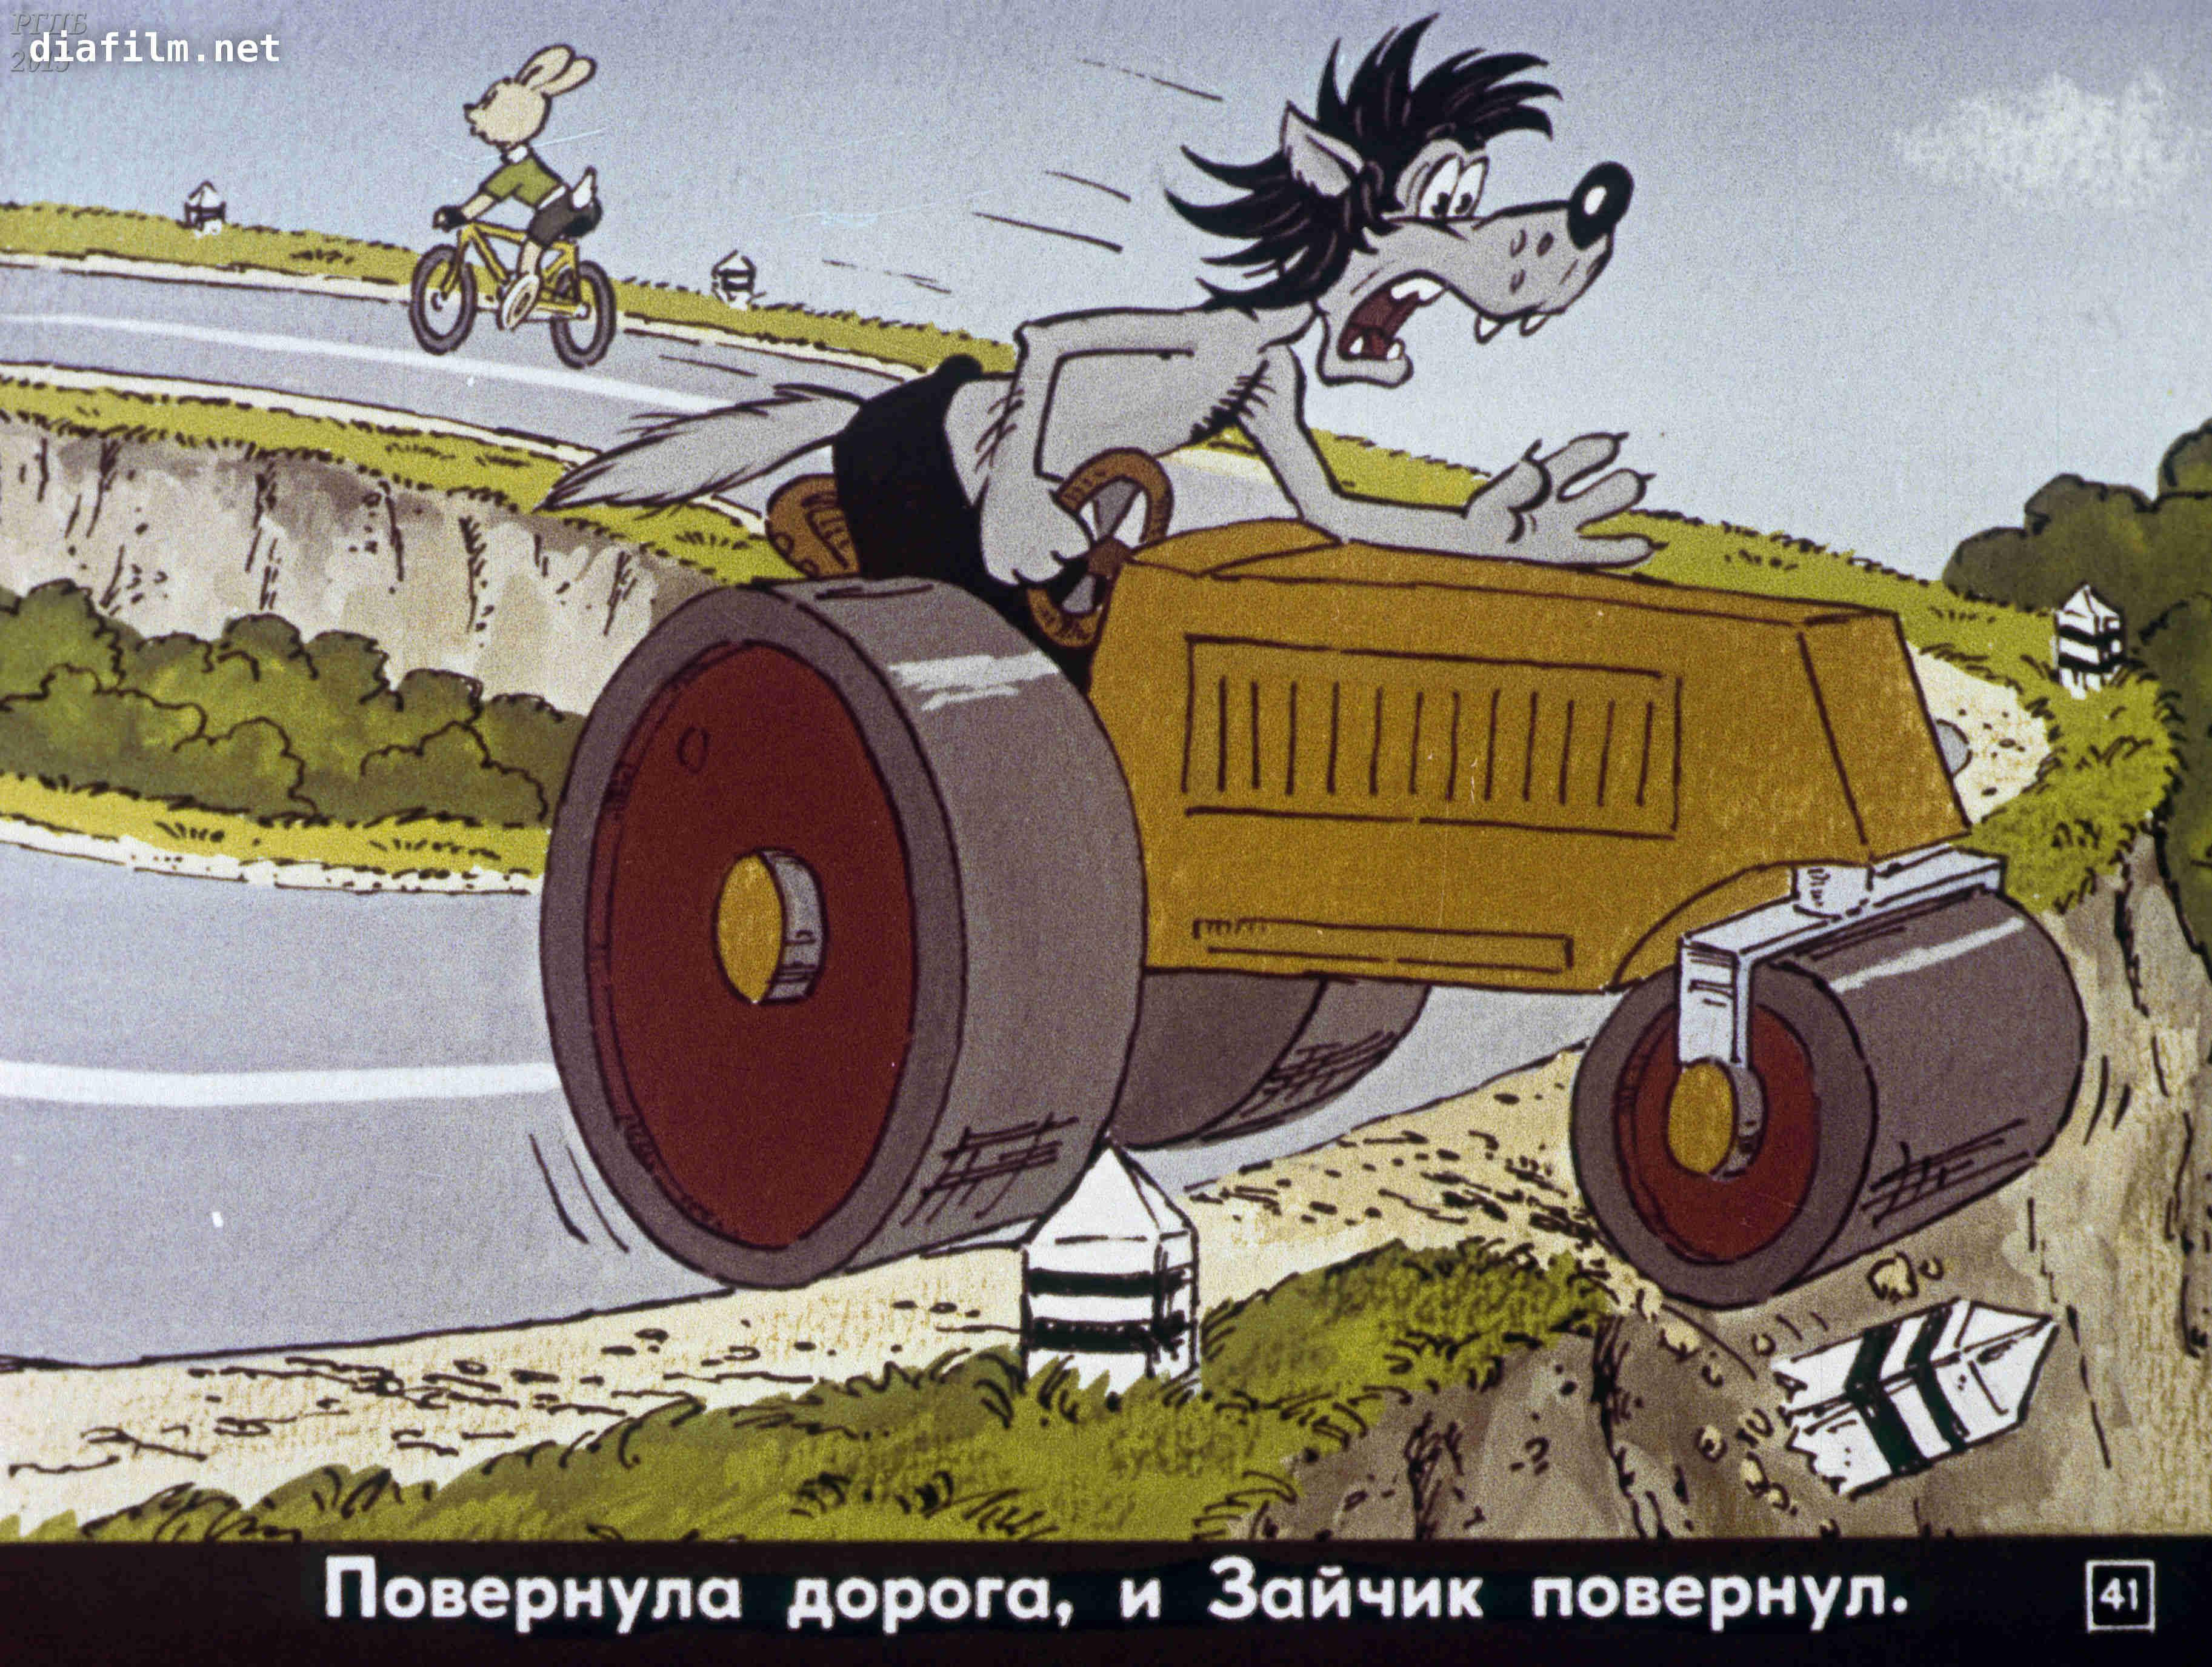 Ну погоди картинка волк на тракторе